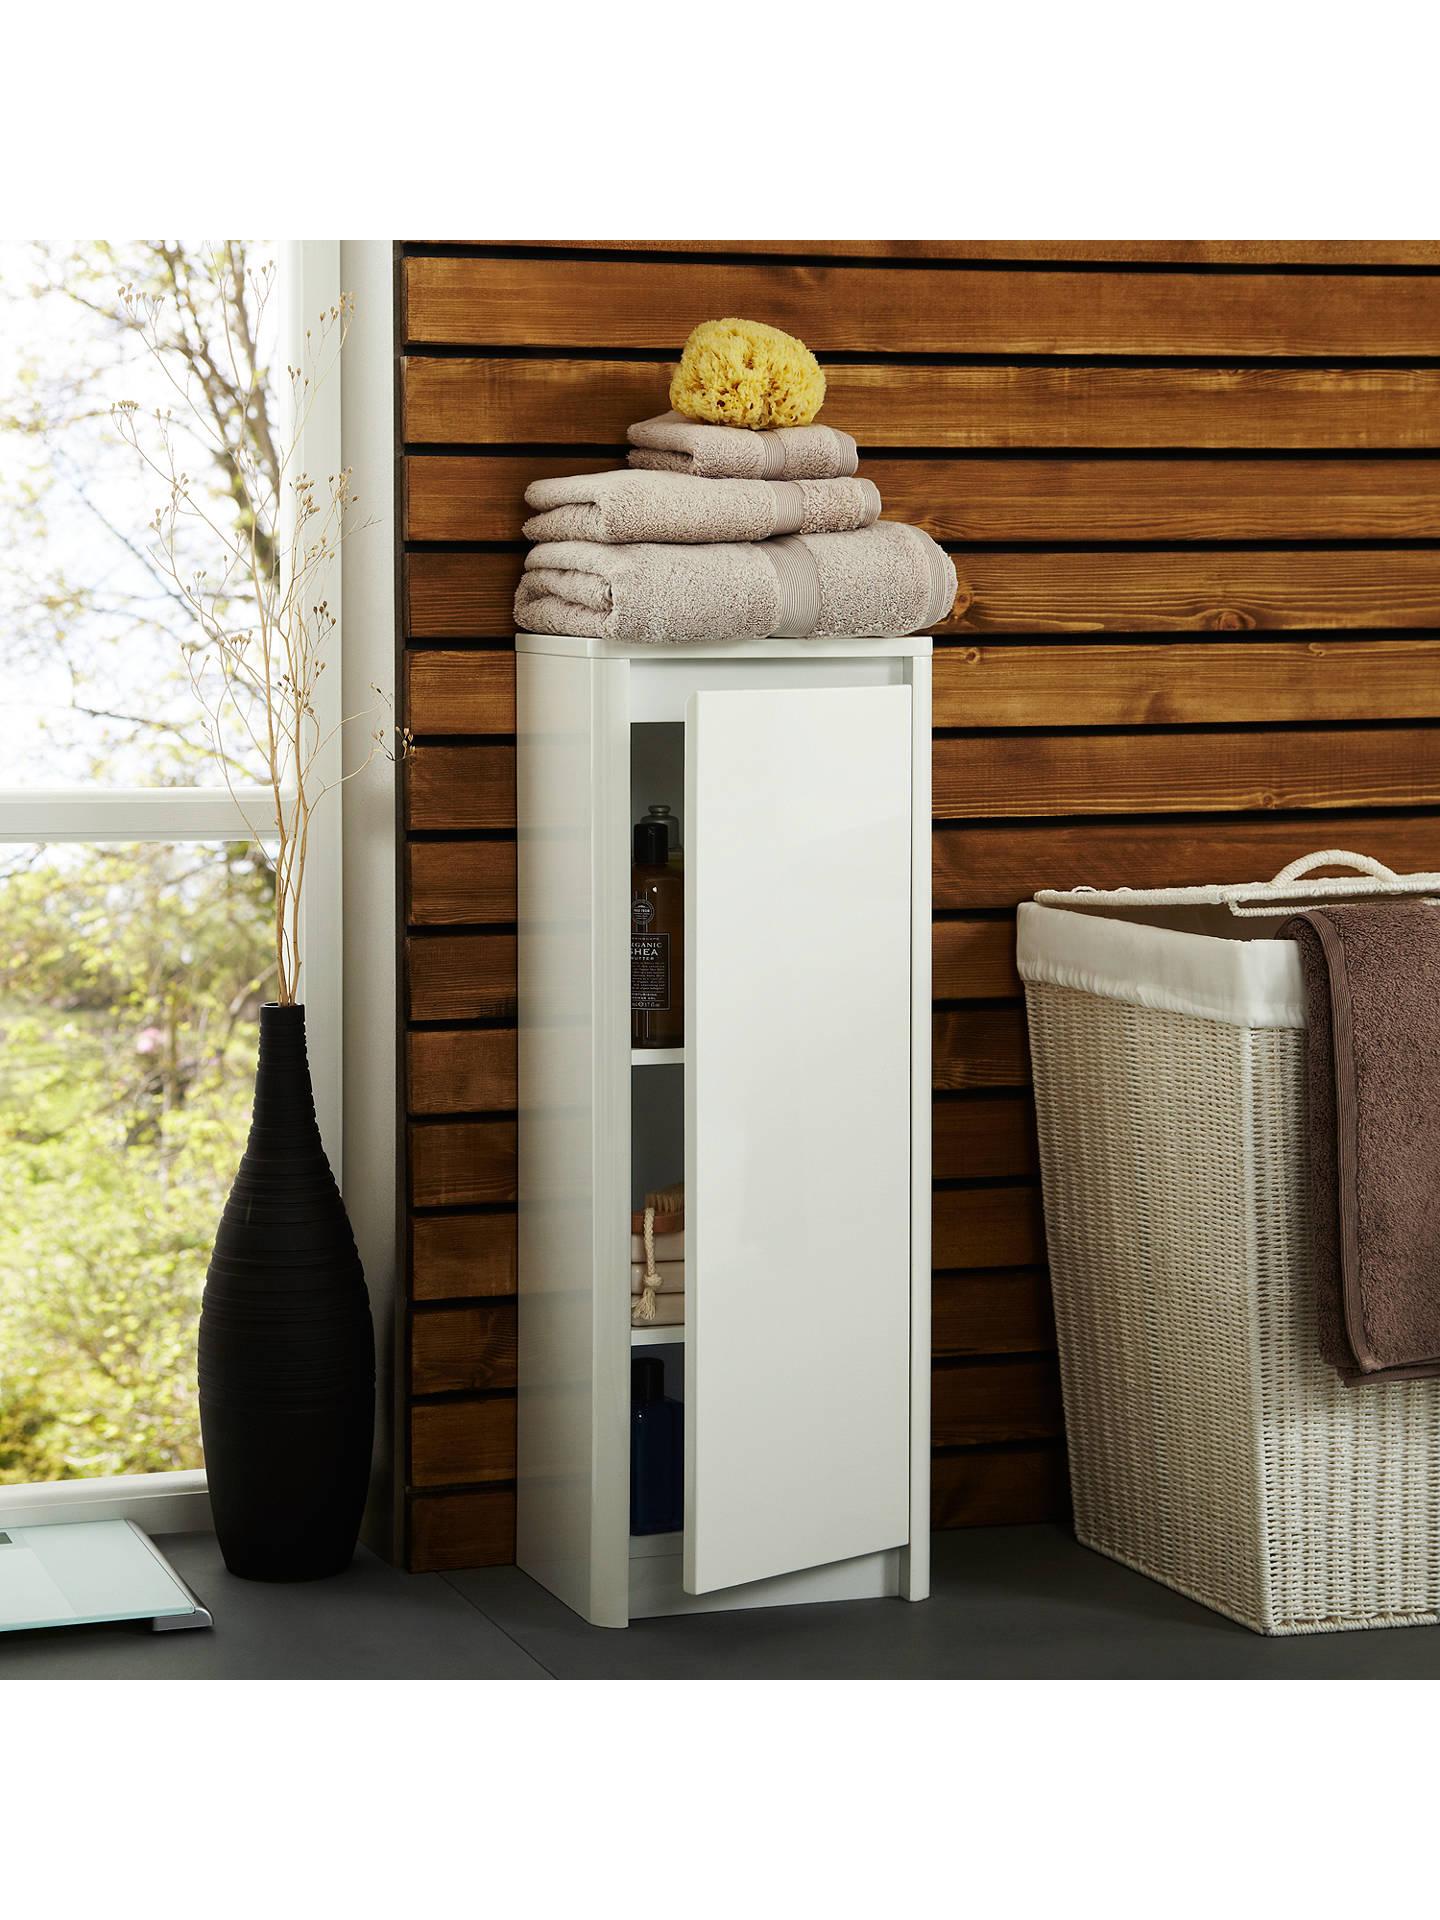 Buy John Lewis & Partners Gloss Curve Free Standing Bathroom Floor Cabinet Online at johnlewis.